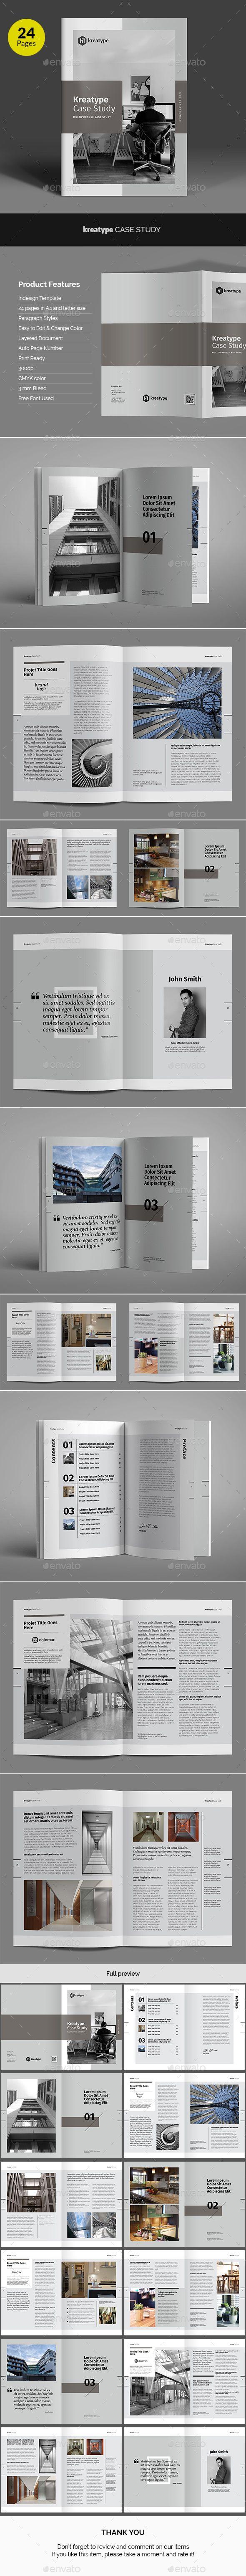 Kreatype Case Study Brochure Template InDesign INDD. Download here: https://graphicriver.net/item/kreatype-case-study/17367644?ref=ksioks